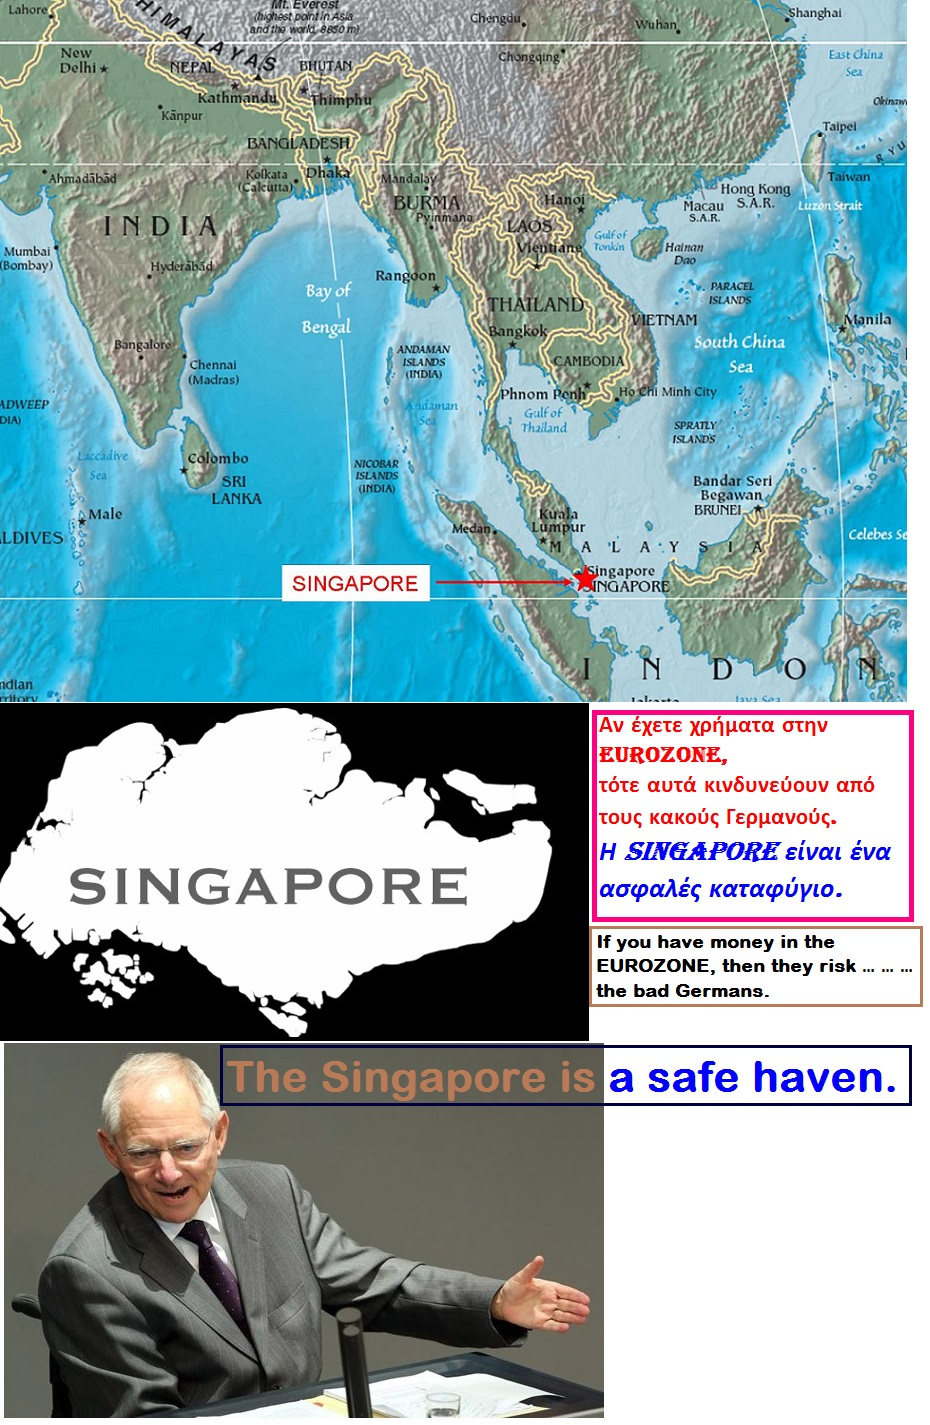 SINGAPORE MONEY 01 02 210313